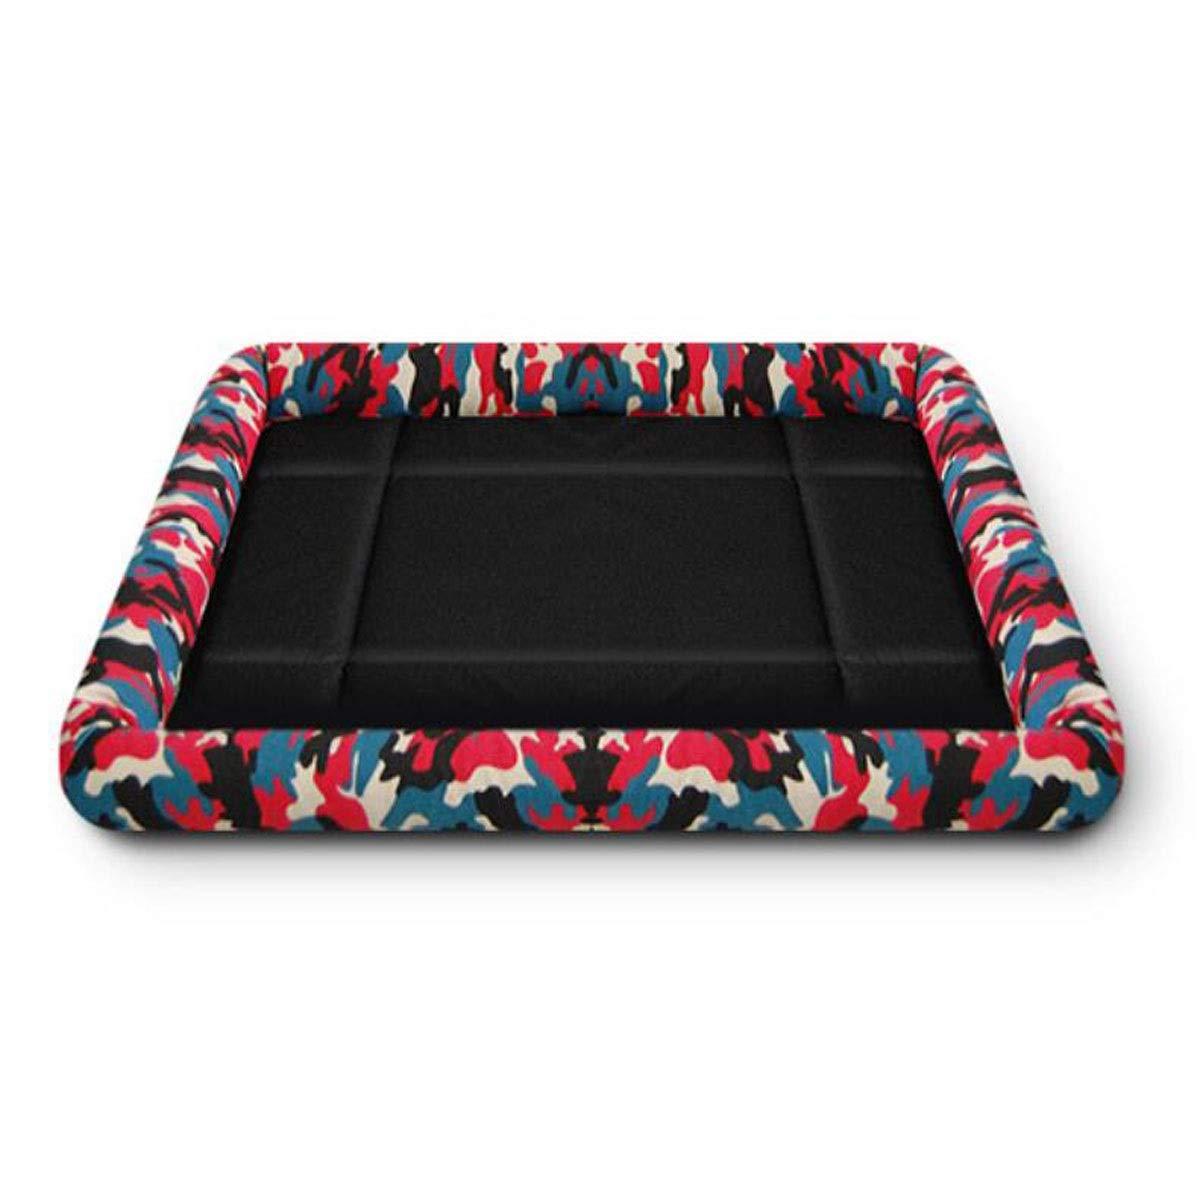 Black SJiansheng Dog Bed, Dog Mattress, Large And Medium Pet Waterproof Sleeping Mat, Dog Cage Sofa Floor Car Sleeping Mat Foldable, bluee XL (color   Black, Size   S)